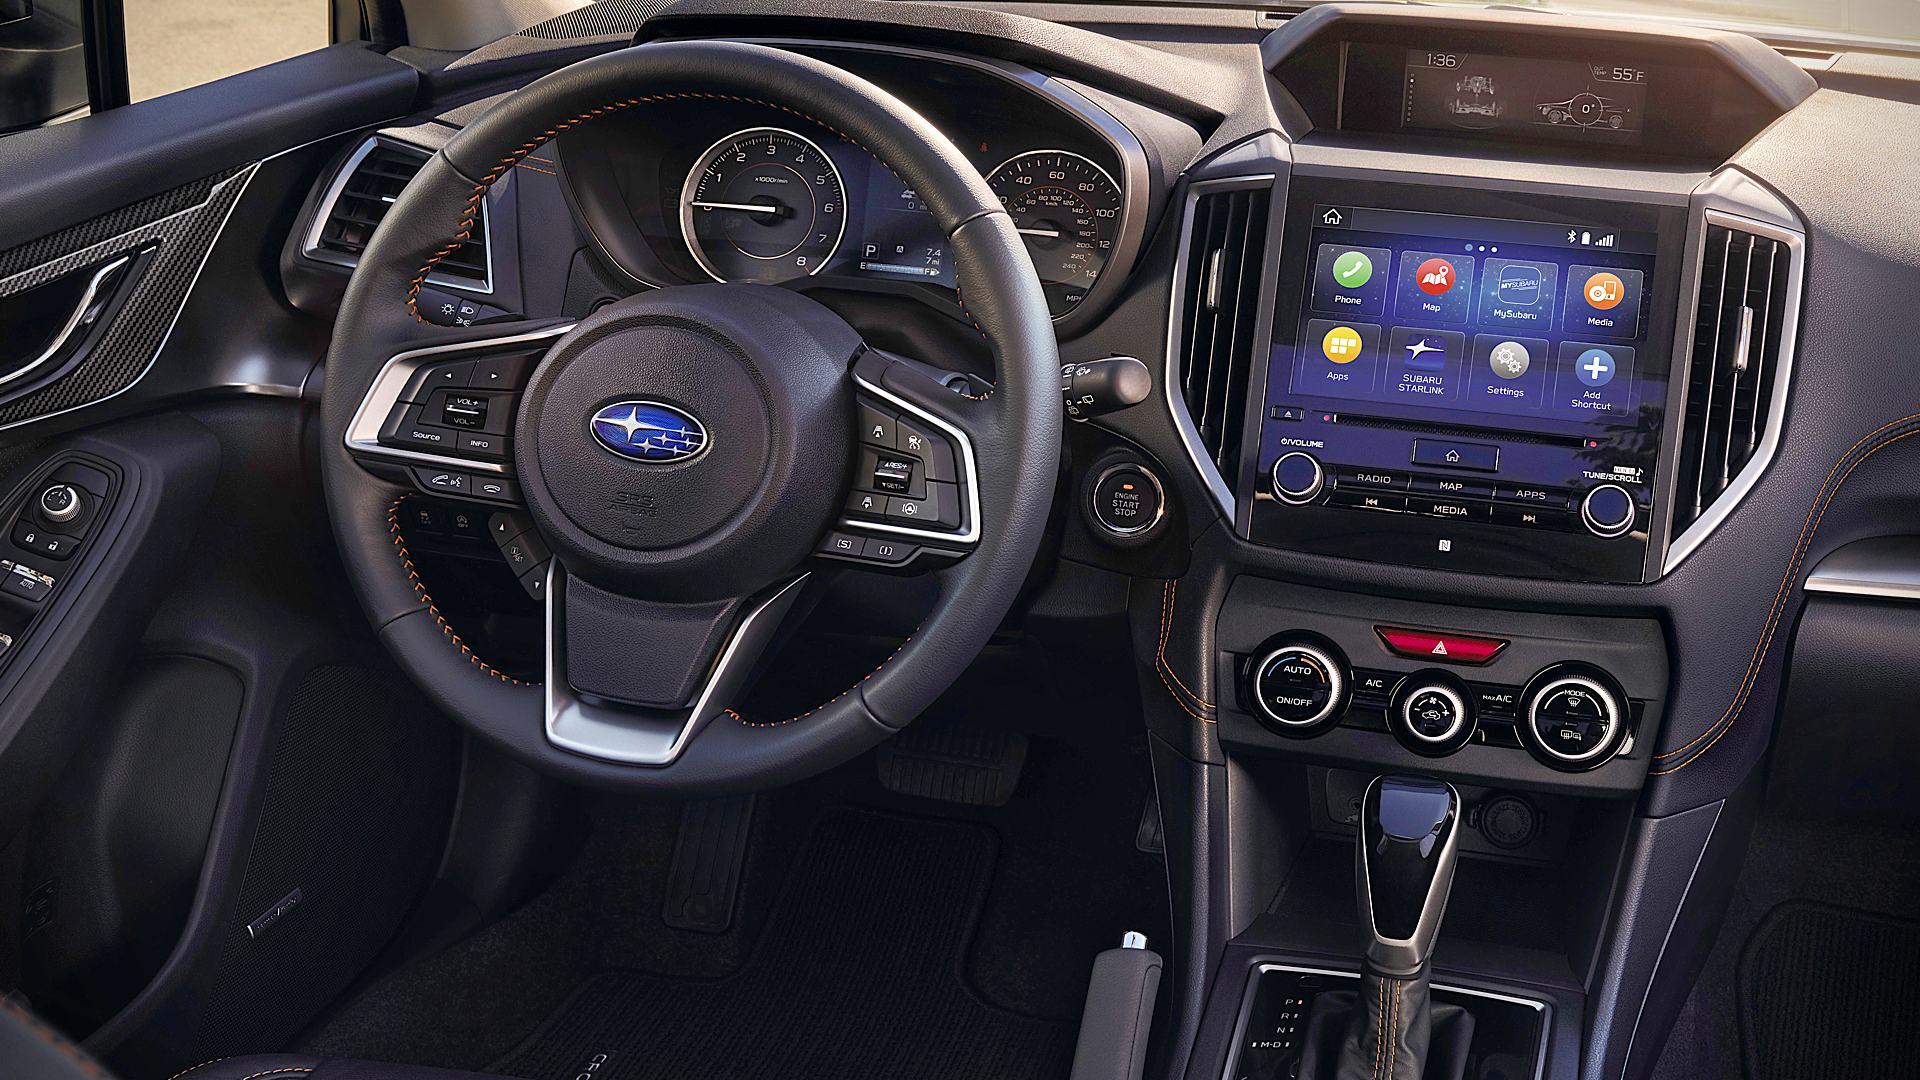 20 Subaru Crosstrek Interior Pictures Price and Release Date